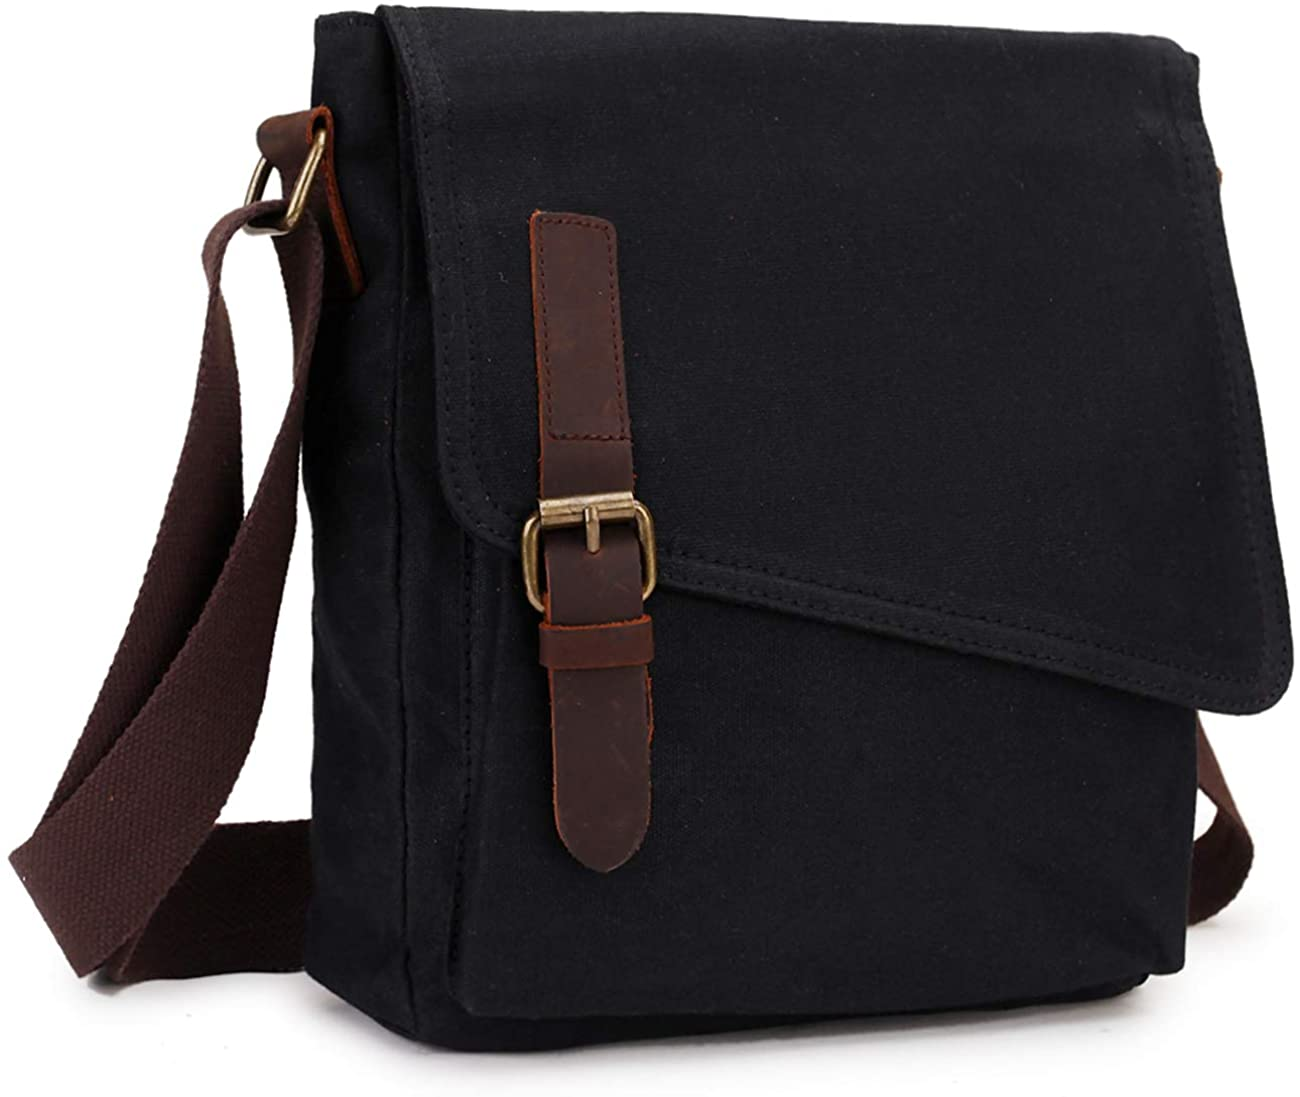 Small Messenger Bag,VONXURY Water Resistant Shoulder Bag Canvas Crossbody Purse for Women Men